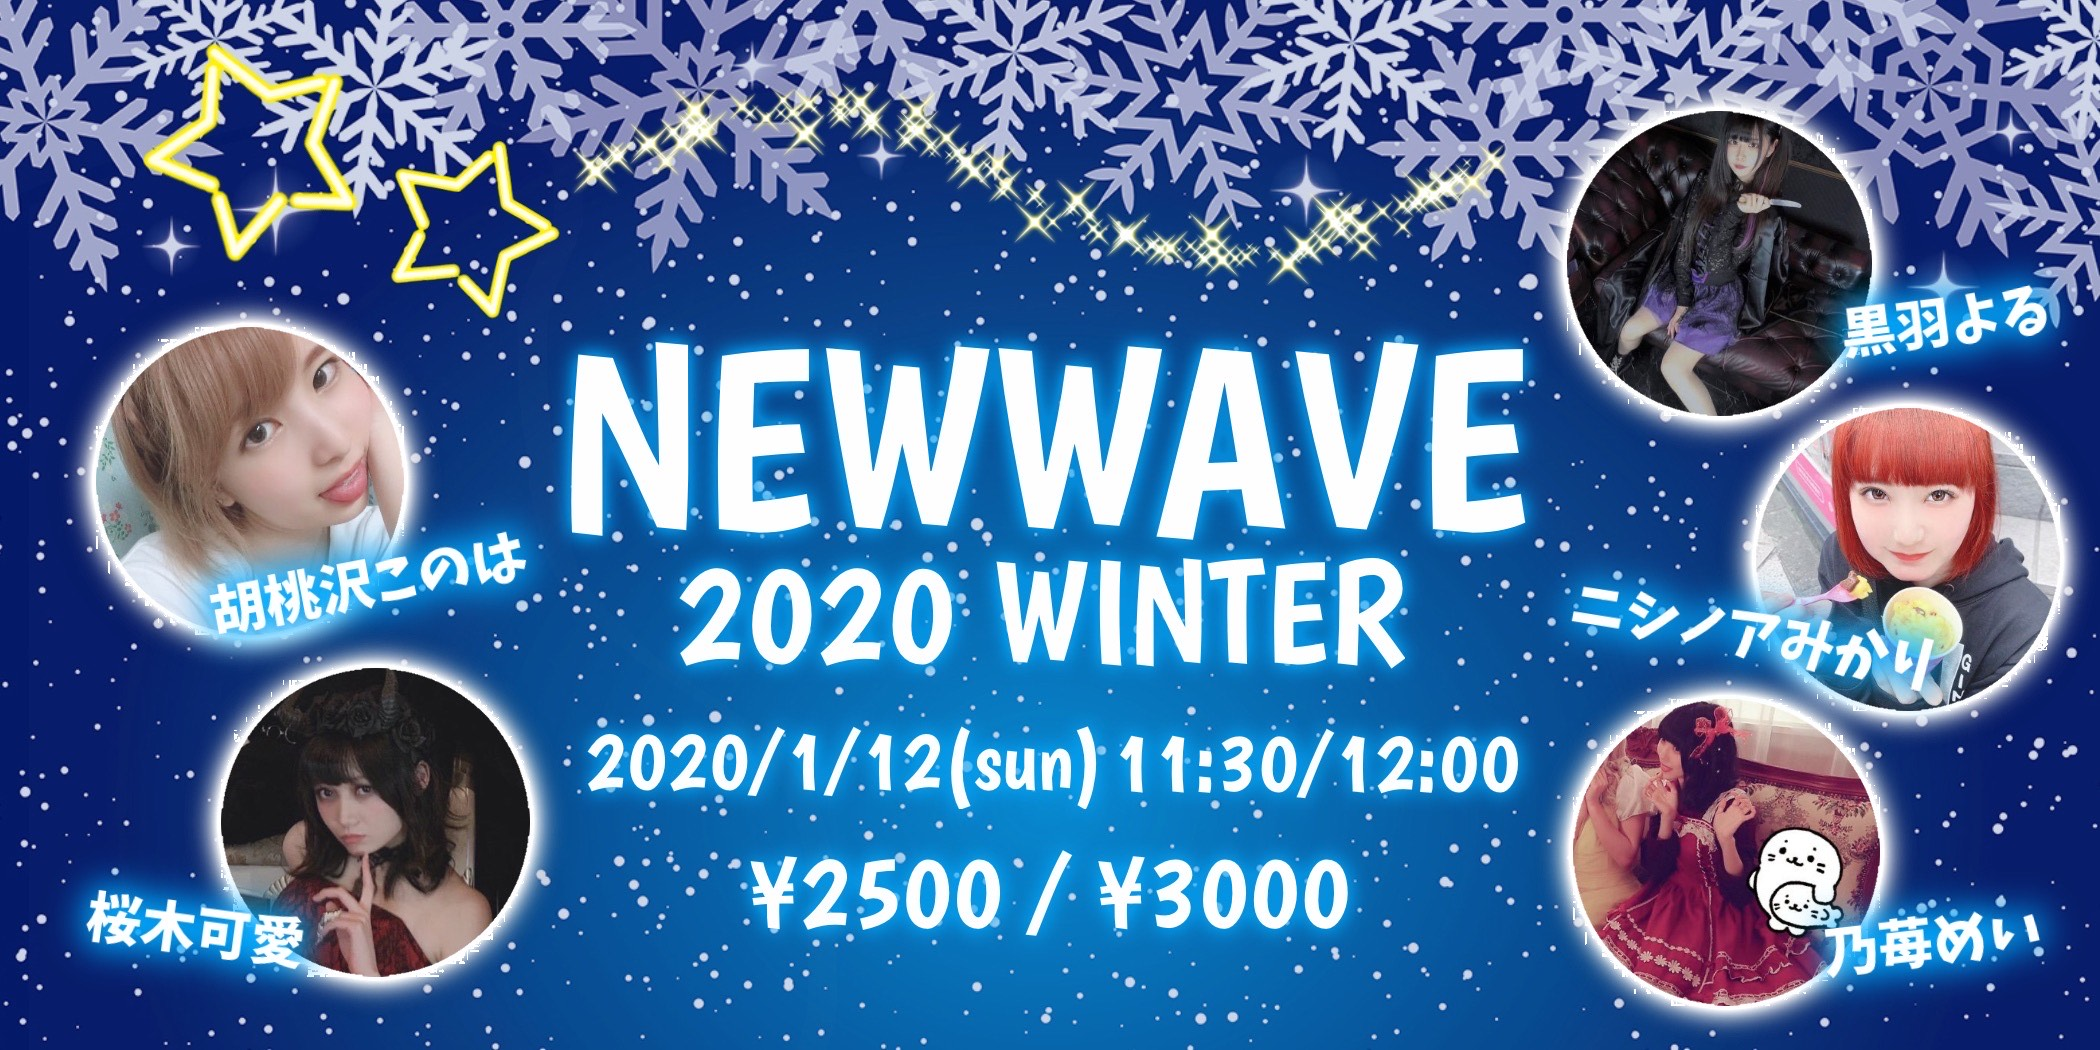 NEWWAVE2020 WINTER